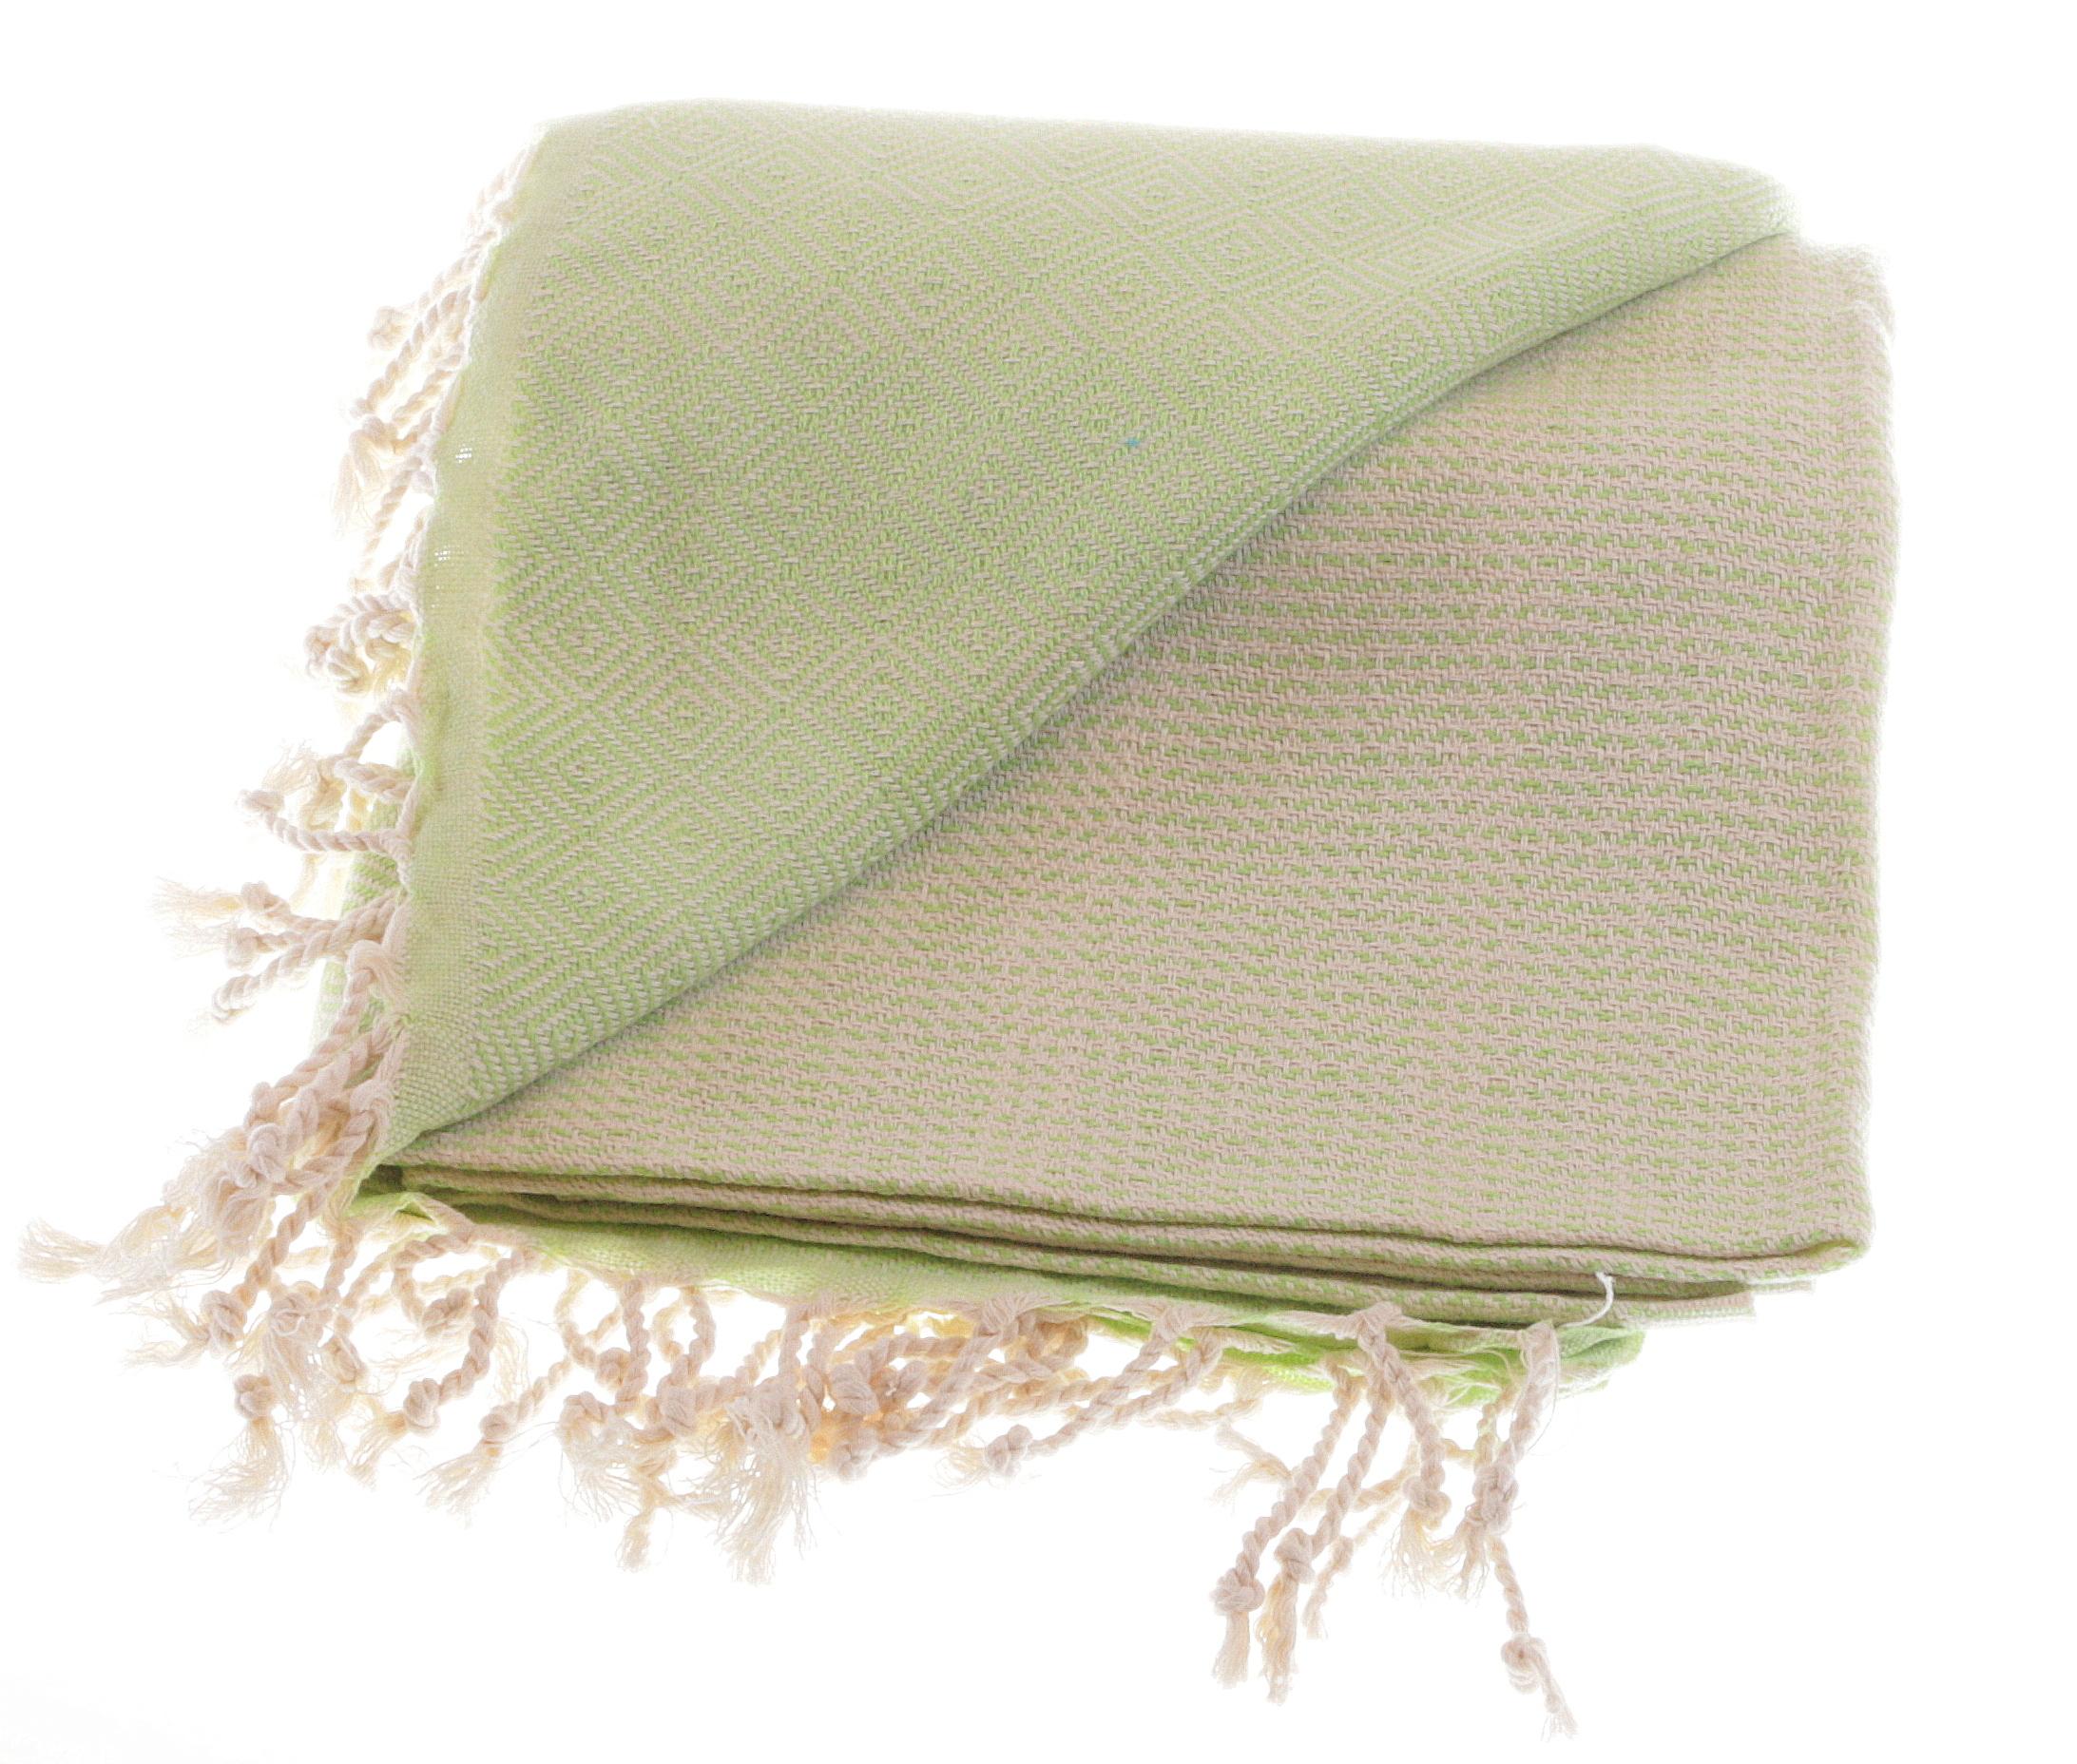 elmas-nature-applegreen-cotton-towel